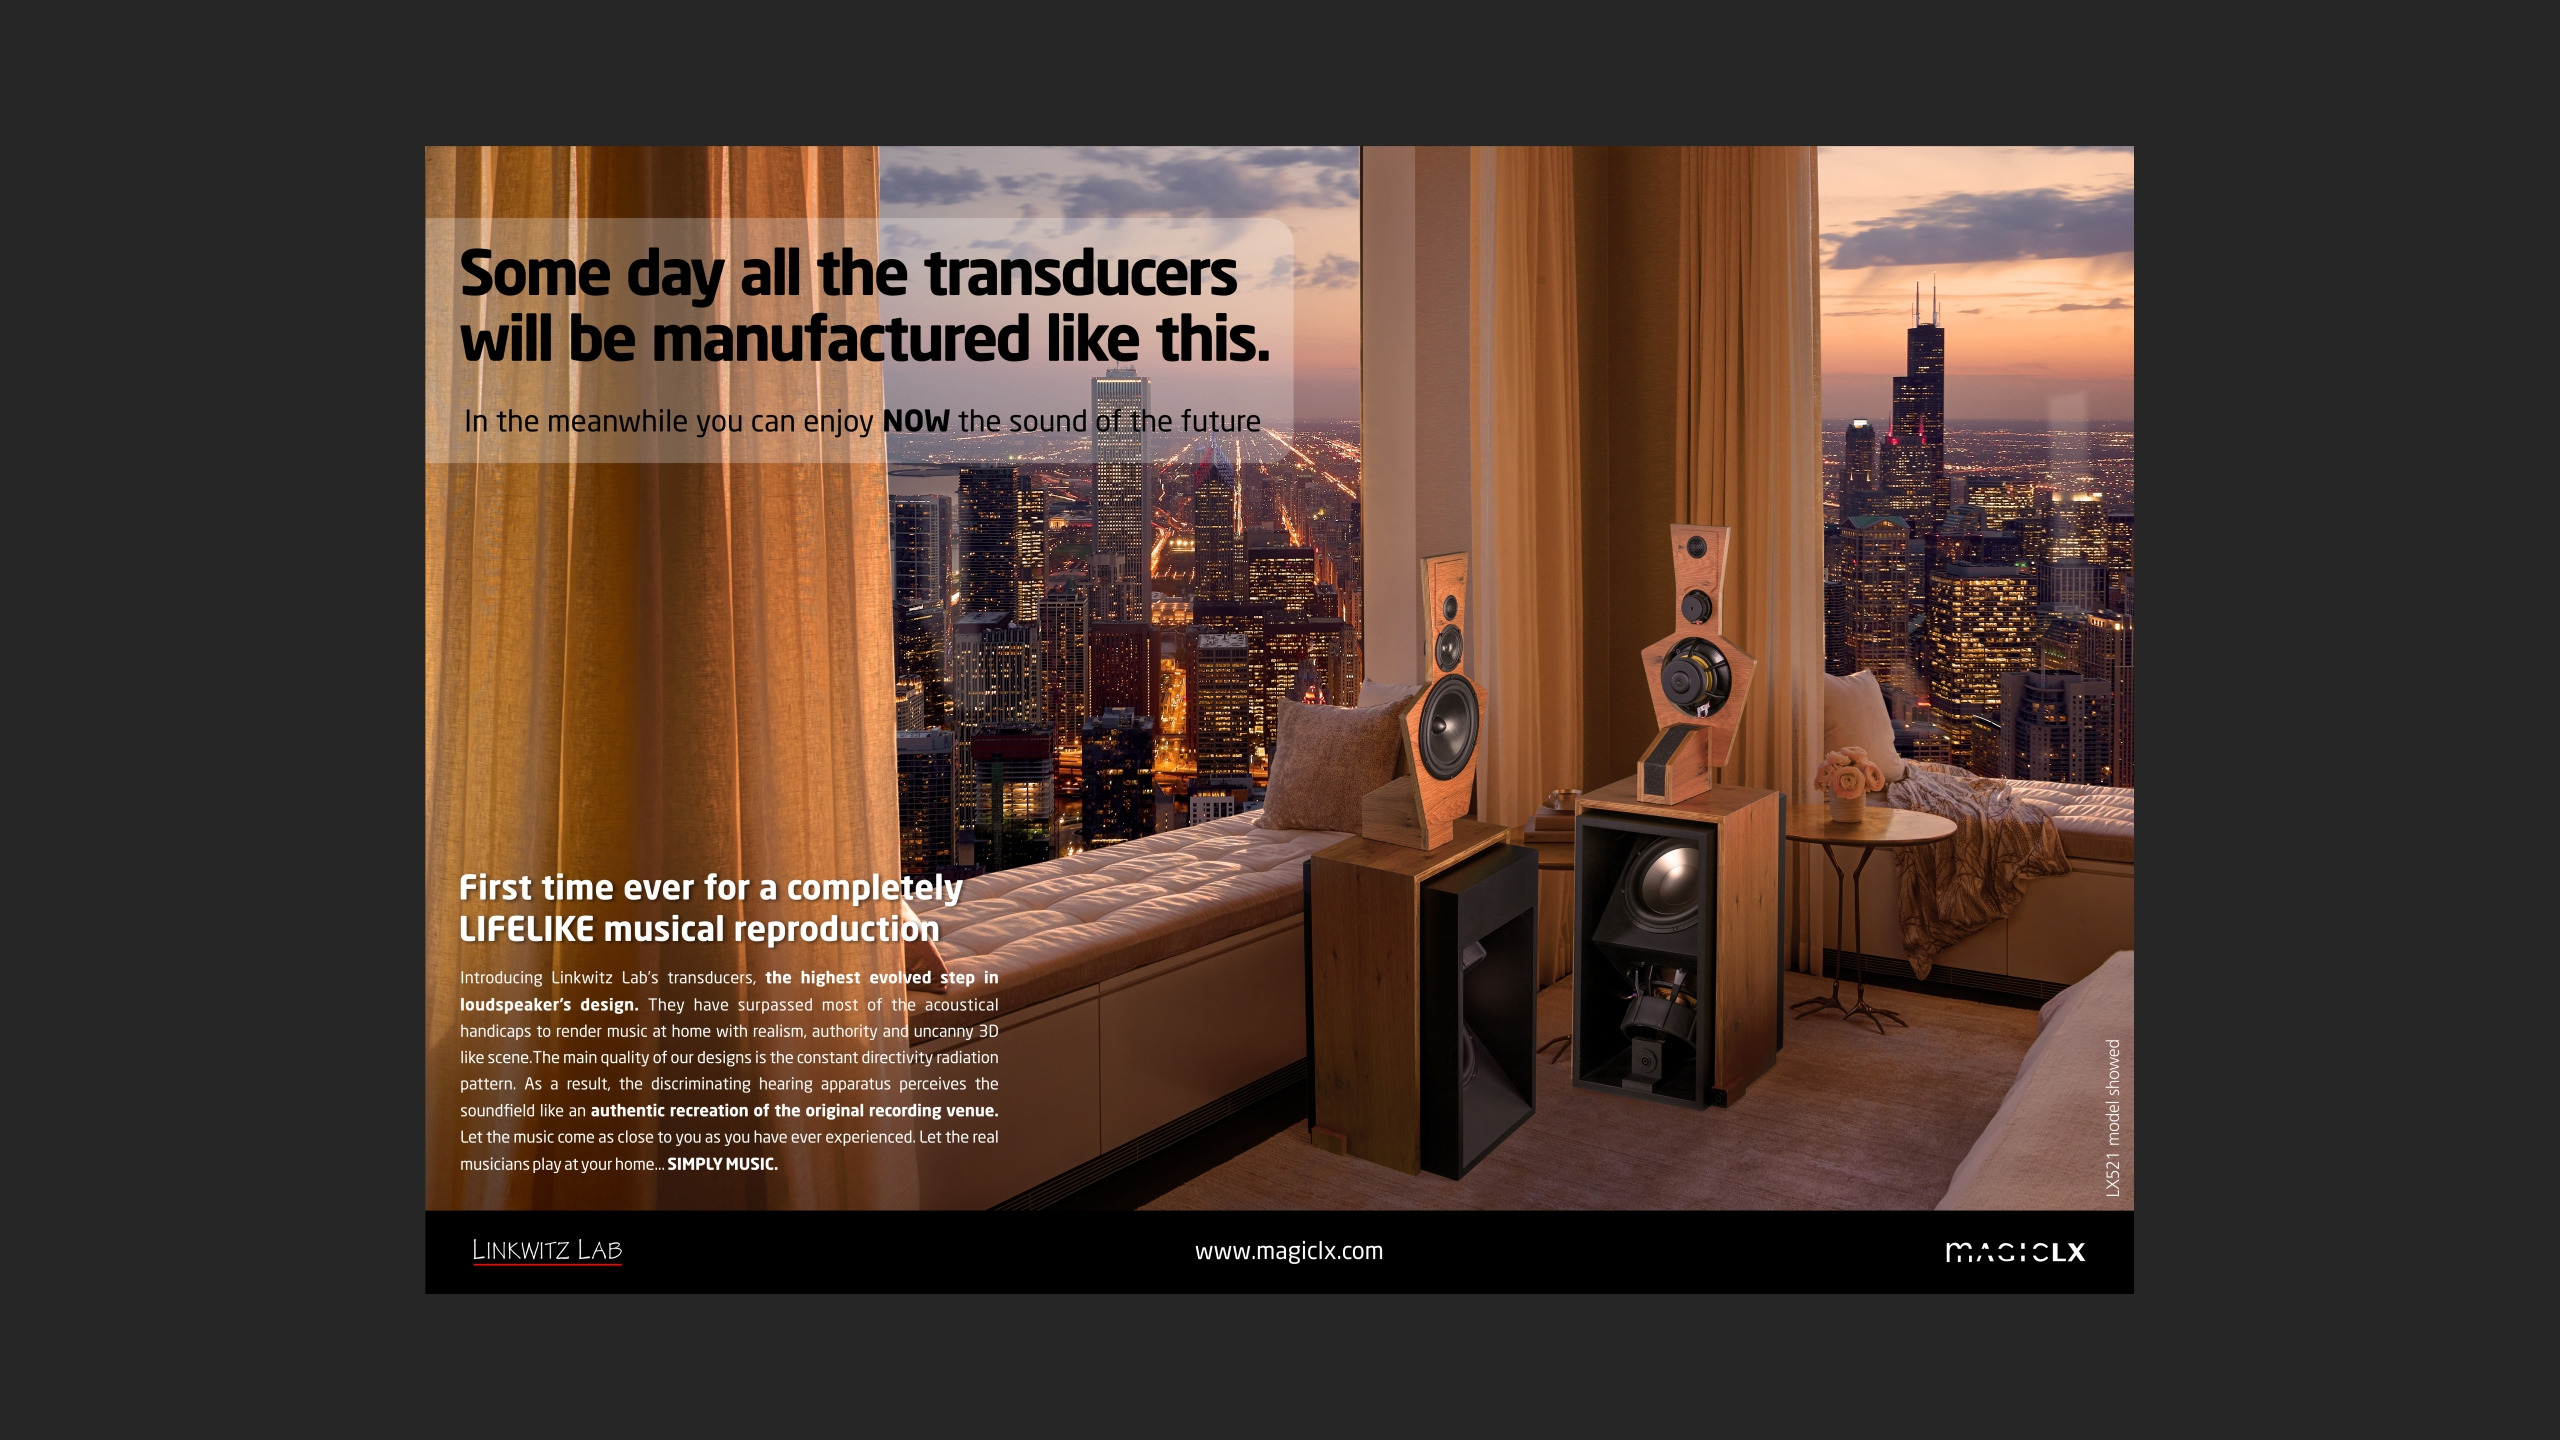 Diseño magiclx lx521 ad